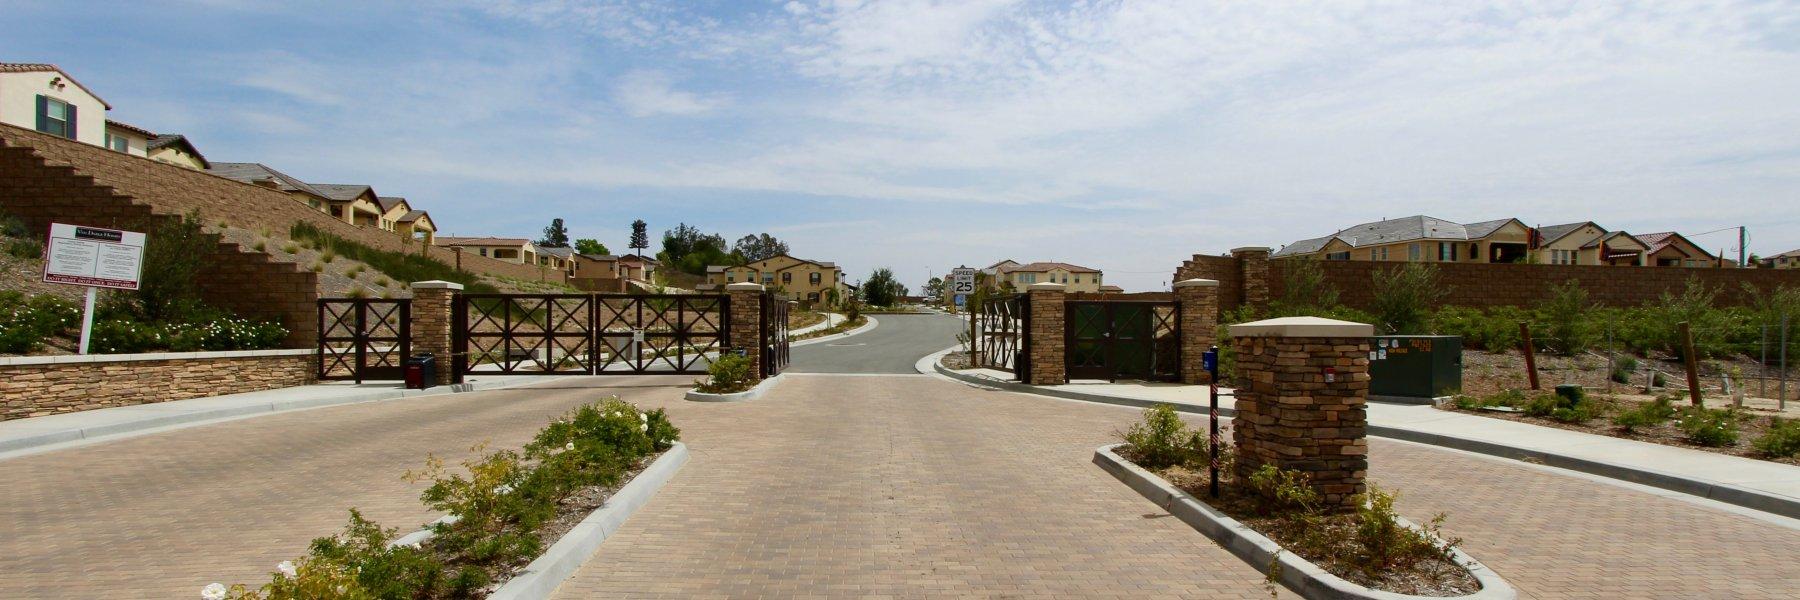 The Vineyard by Van Daele is a gated community of homes in Temecula California